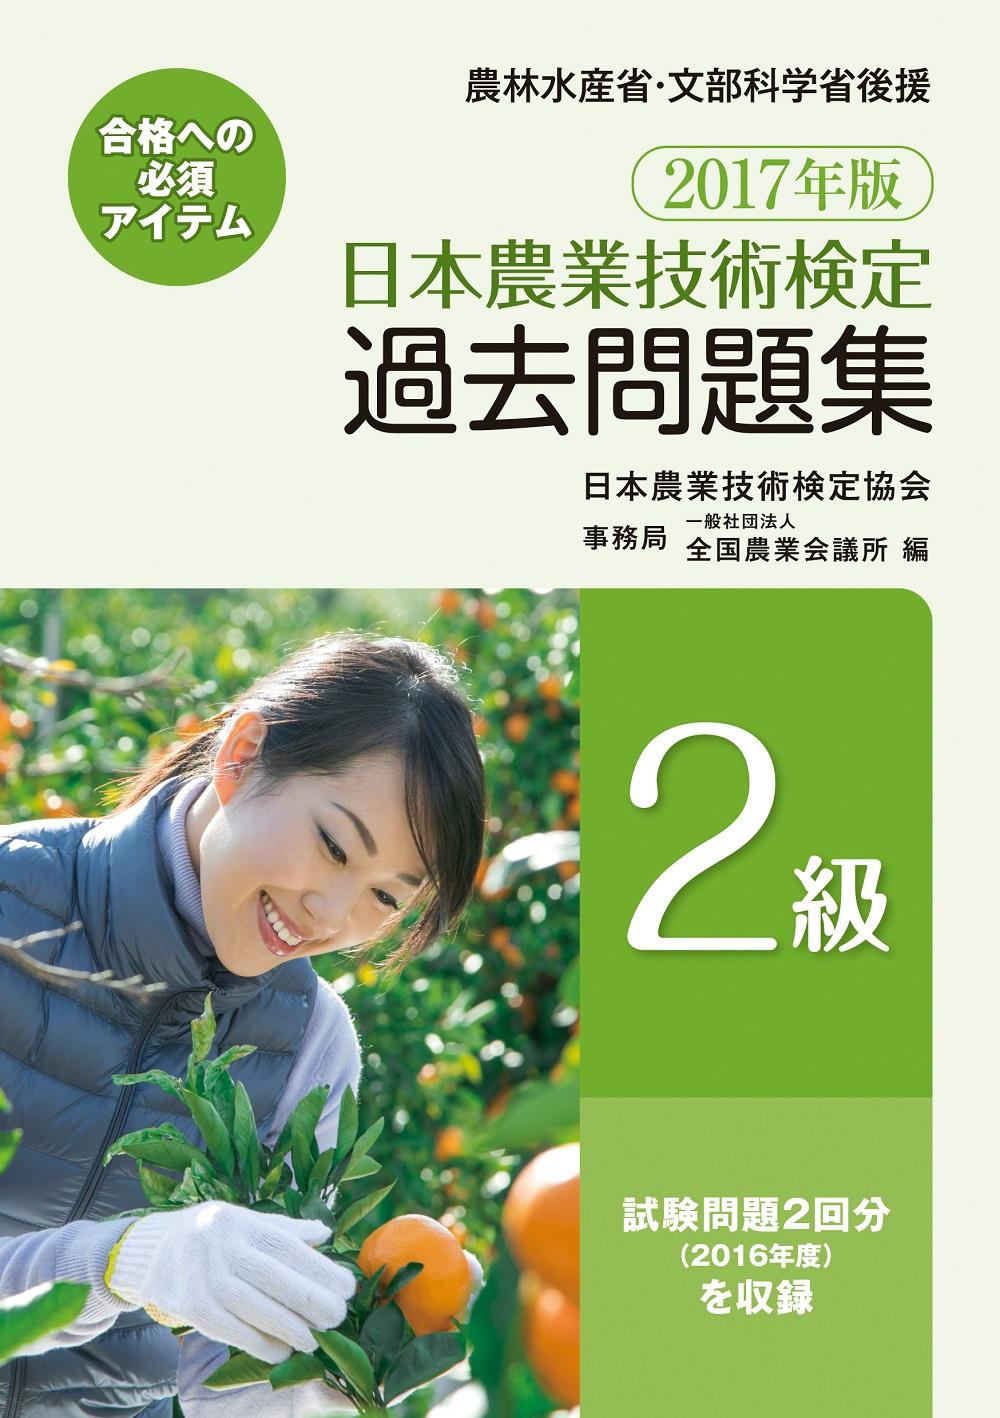 2.問題集、事例ページ画像29-02.jpg